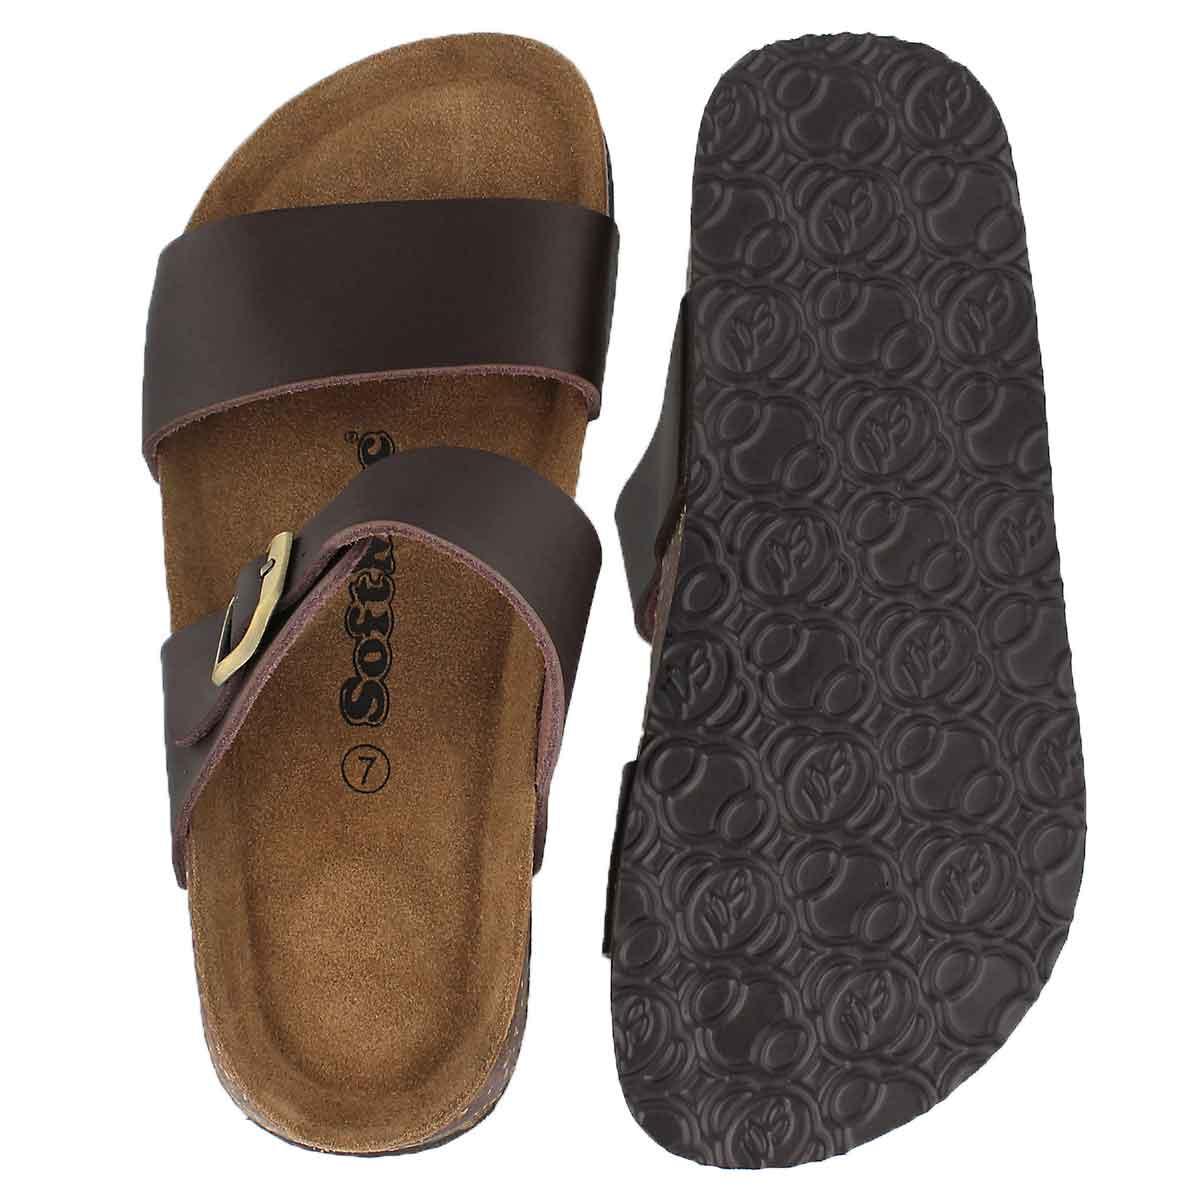 6b696c91ab4 Women's ARIANNA 5 brown memory foam slide sandals